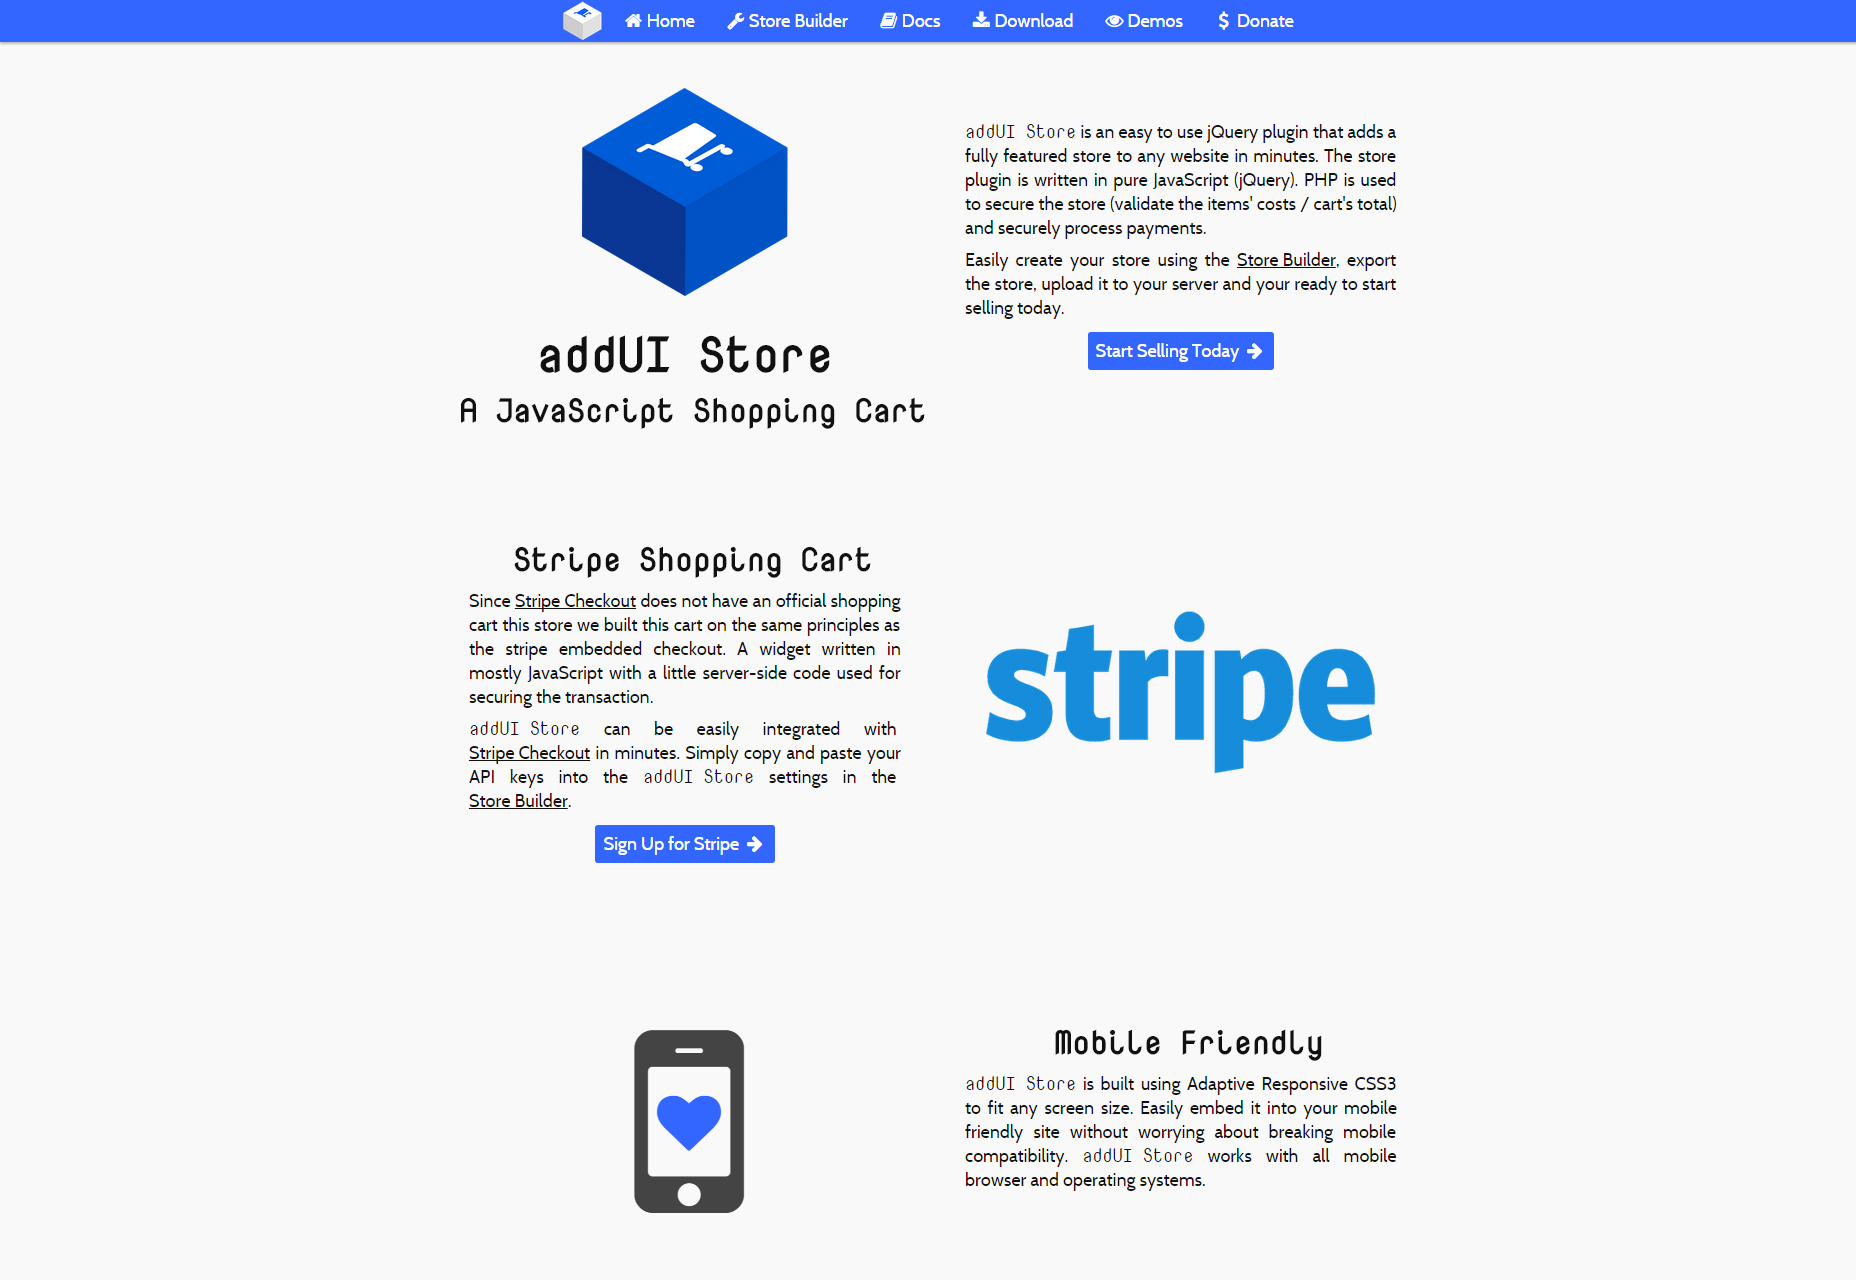 Tienda AddUI: un carrito de compras JavaScript